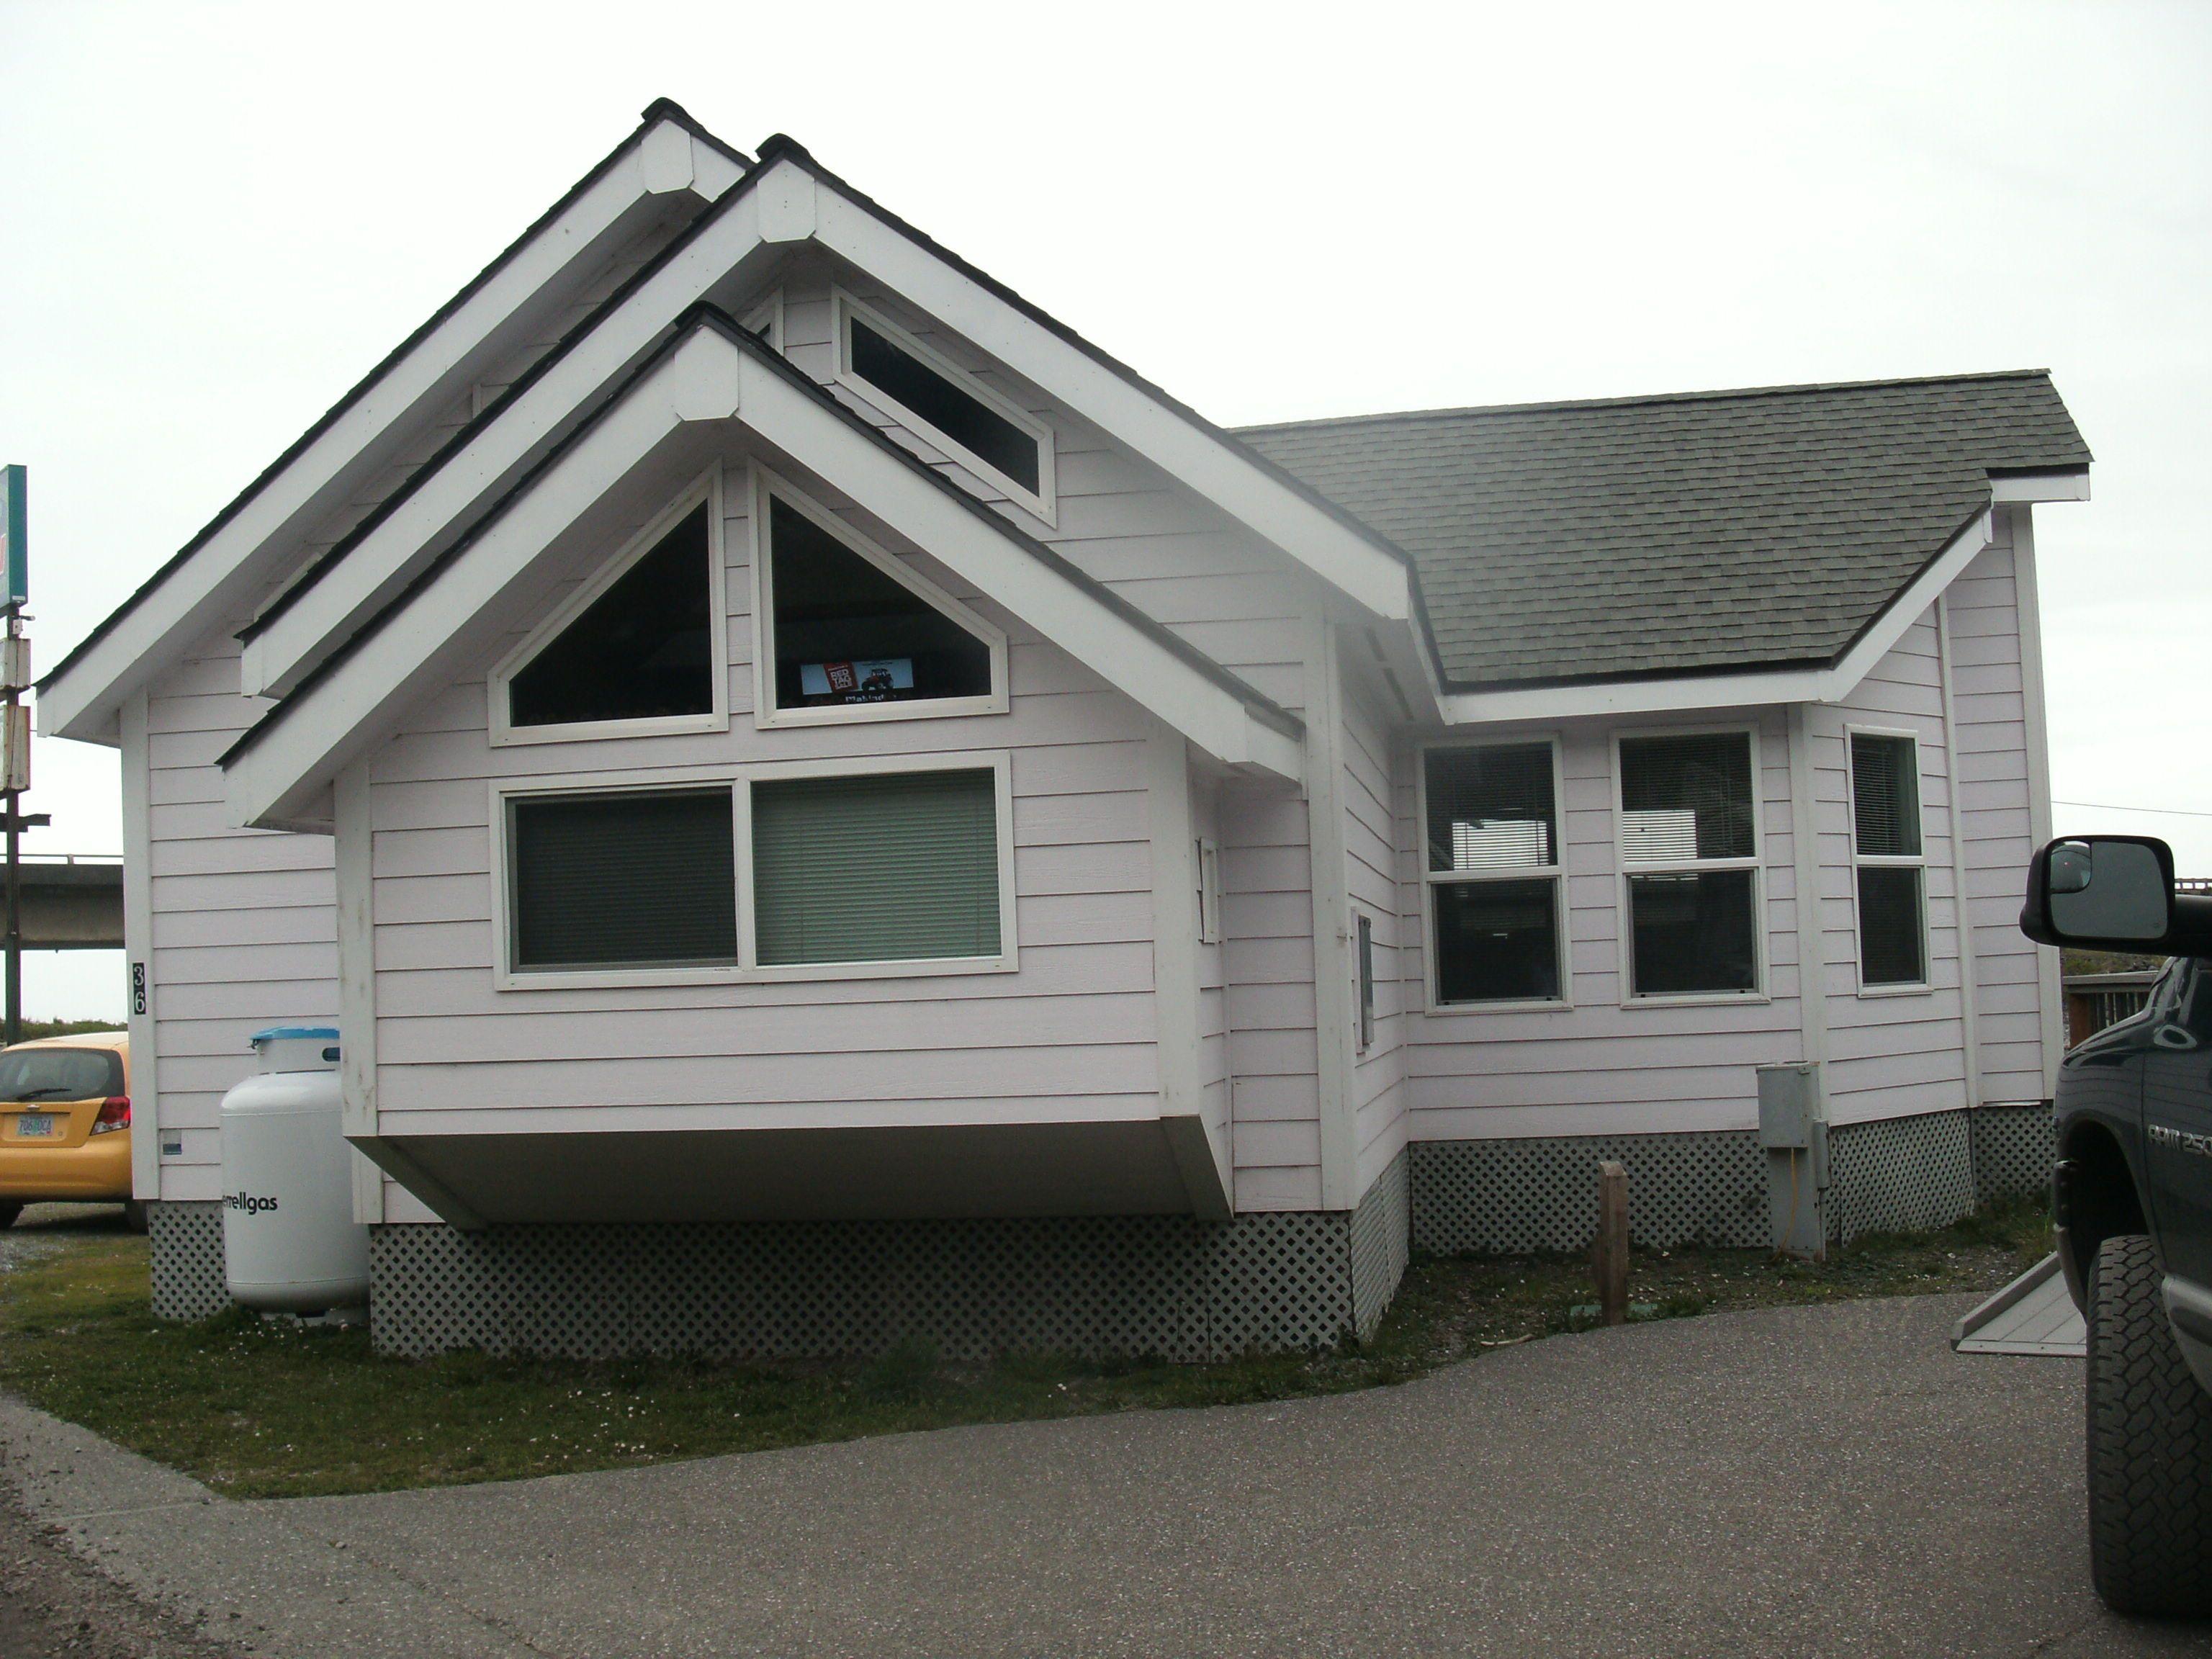 Park Model Home At Turtle Rock Resort Gold Beach Oregon